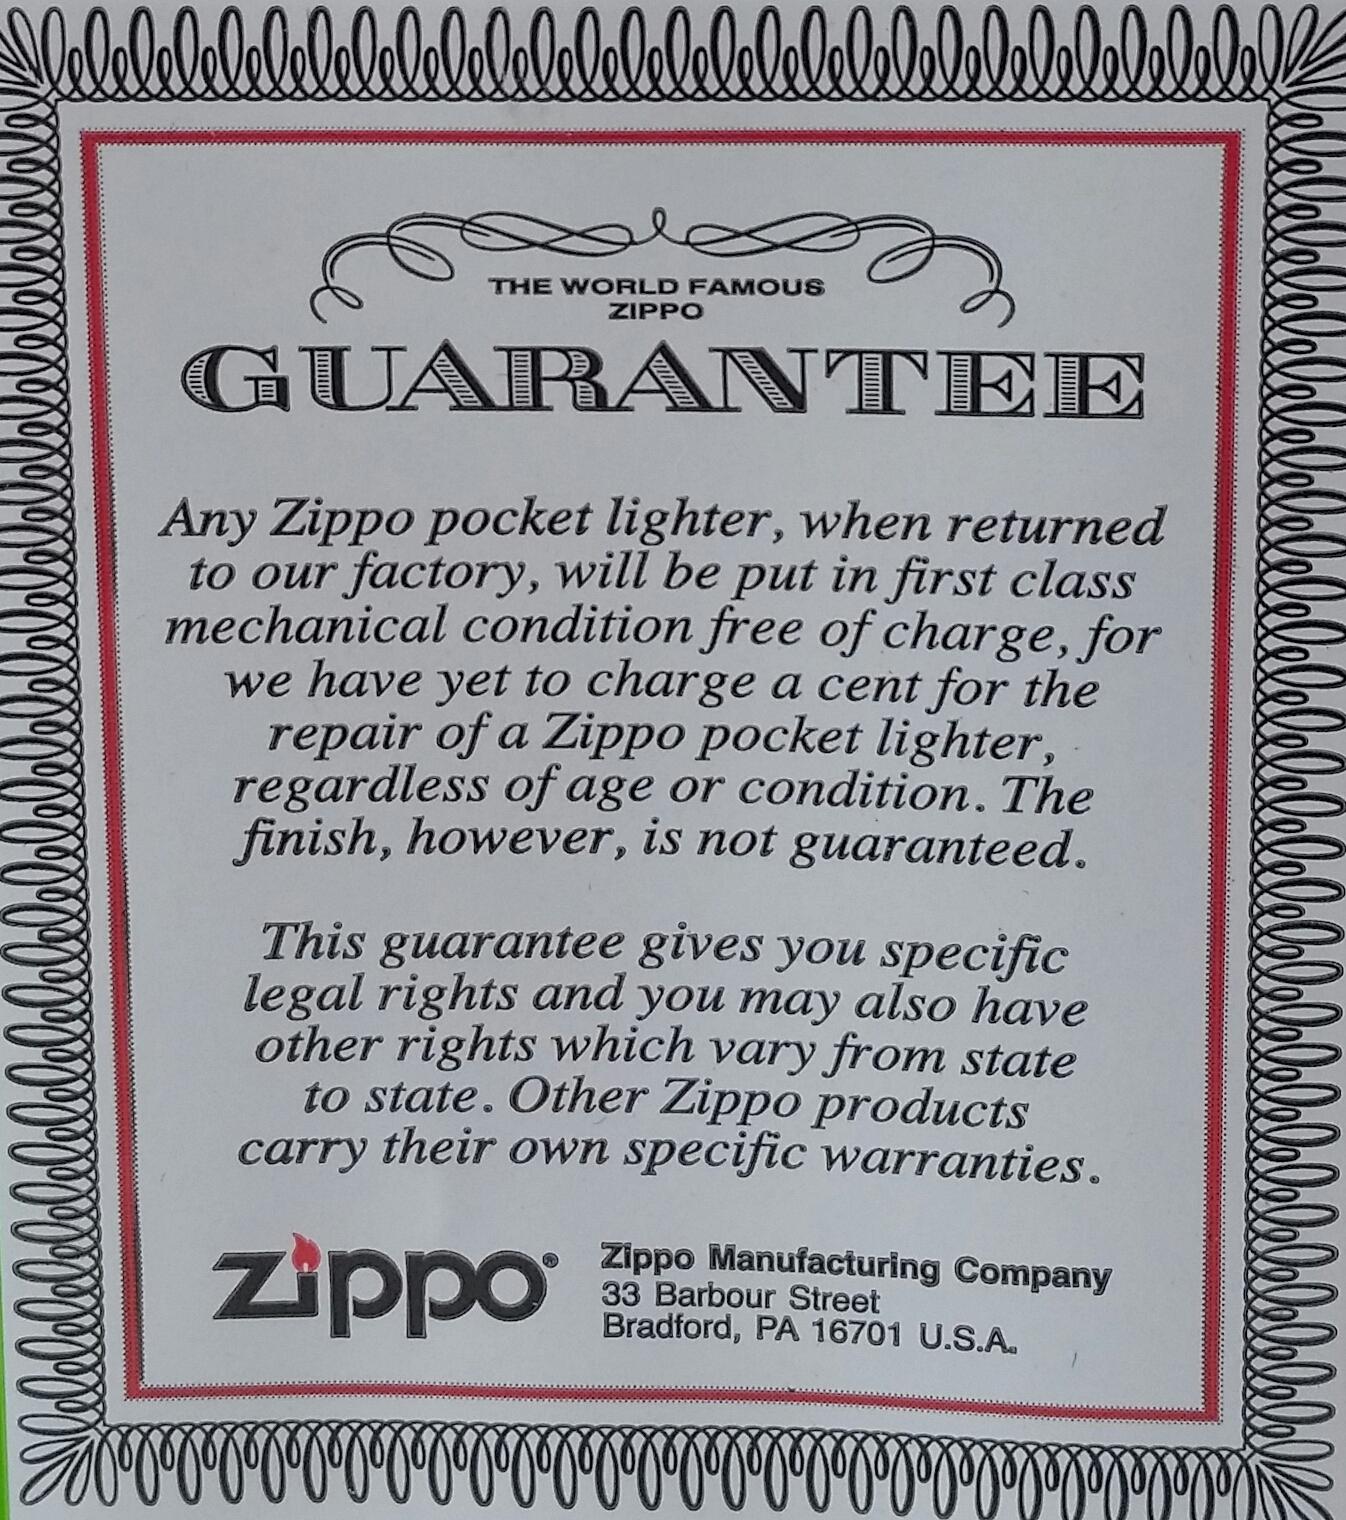 Zippo Guarantee